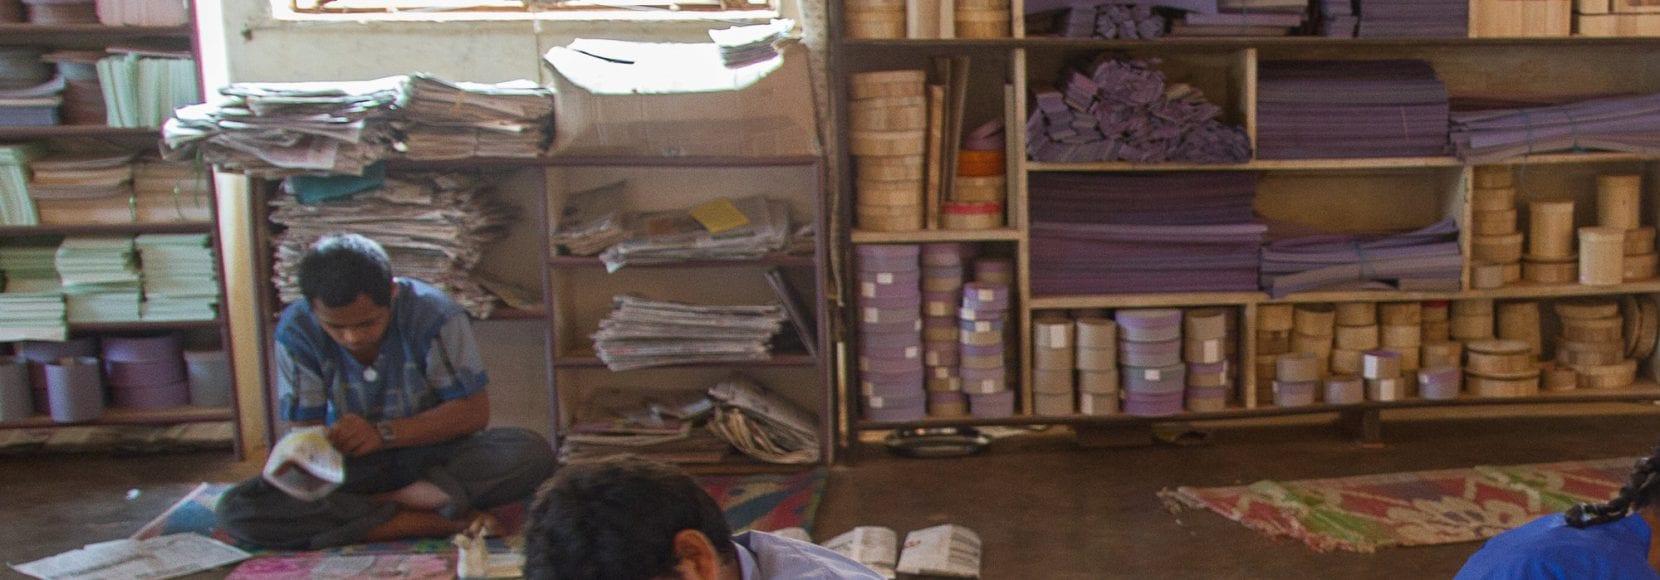 Making paper products at Chetana, Sirsi, North Kanara district, Karnataka state, India. Photo by Nile Sprague, 2013